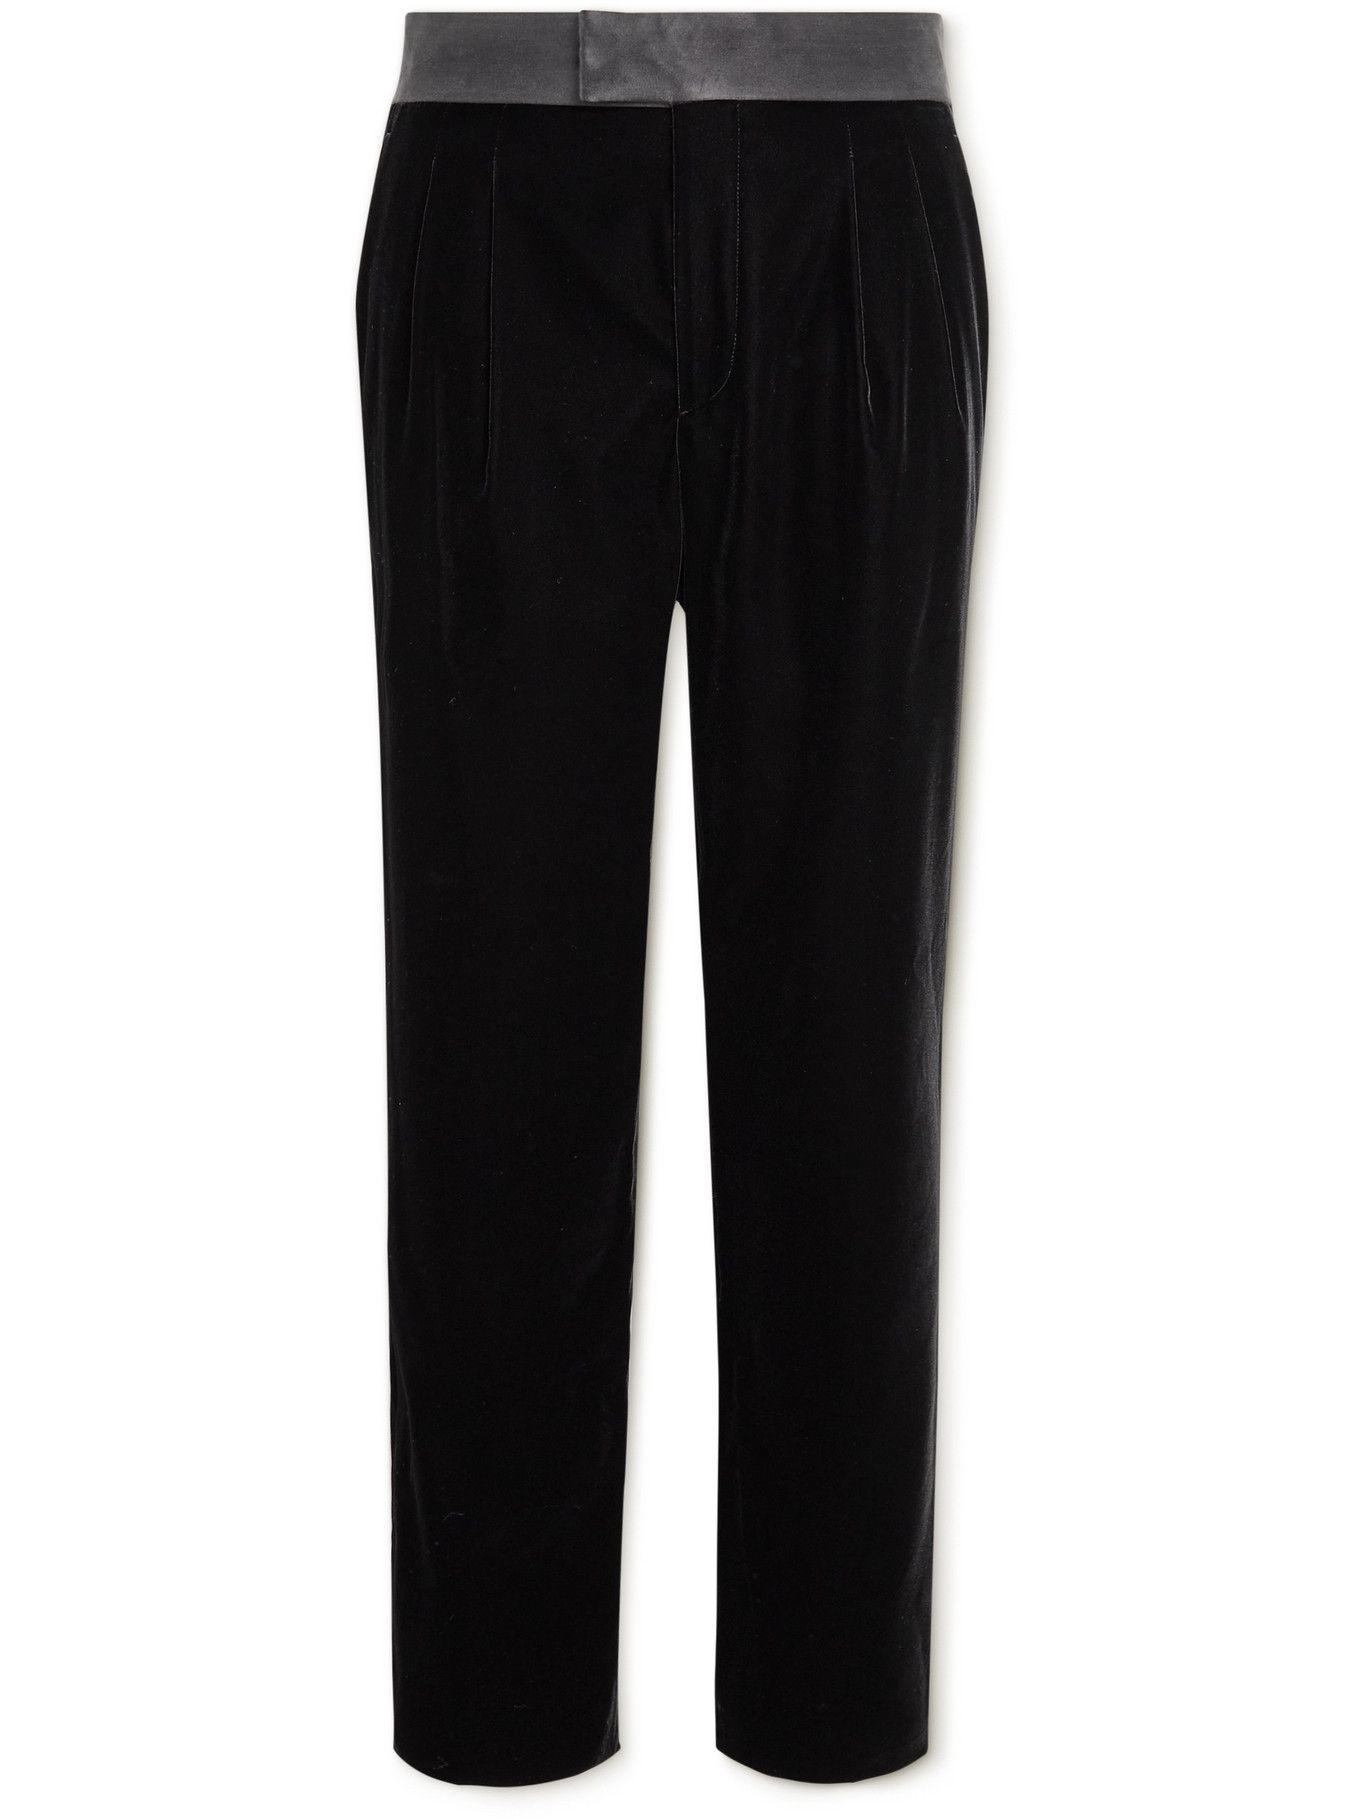 Photo: Giorgio Armani - Satin-Trimmed Velvet Tuxedo Trousers - Black